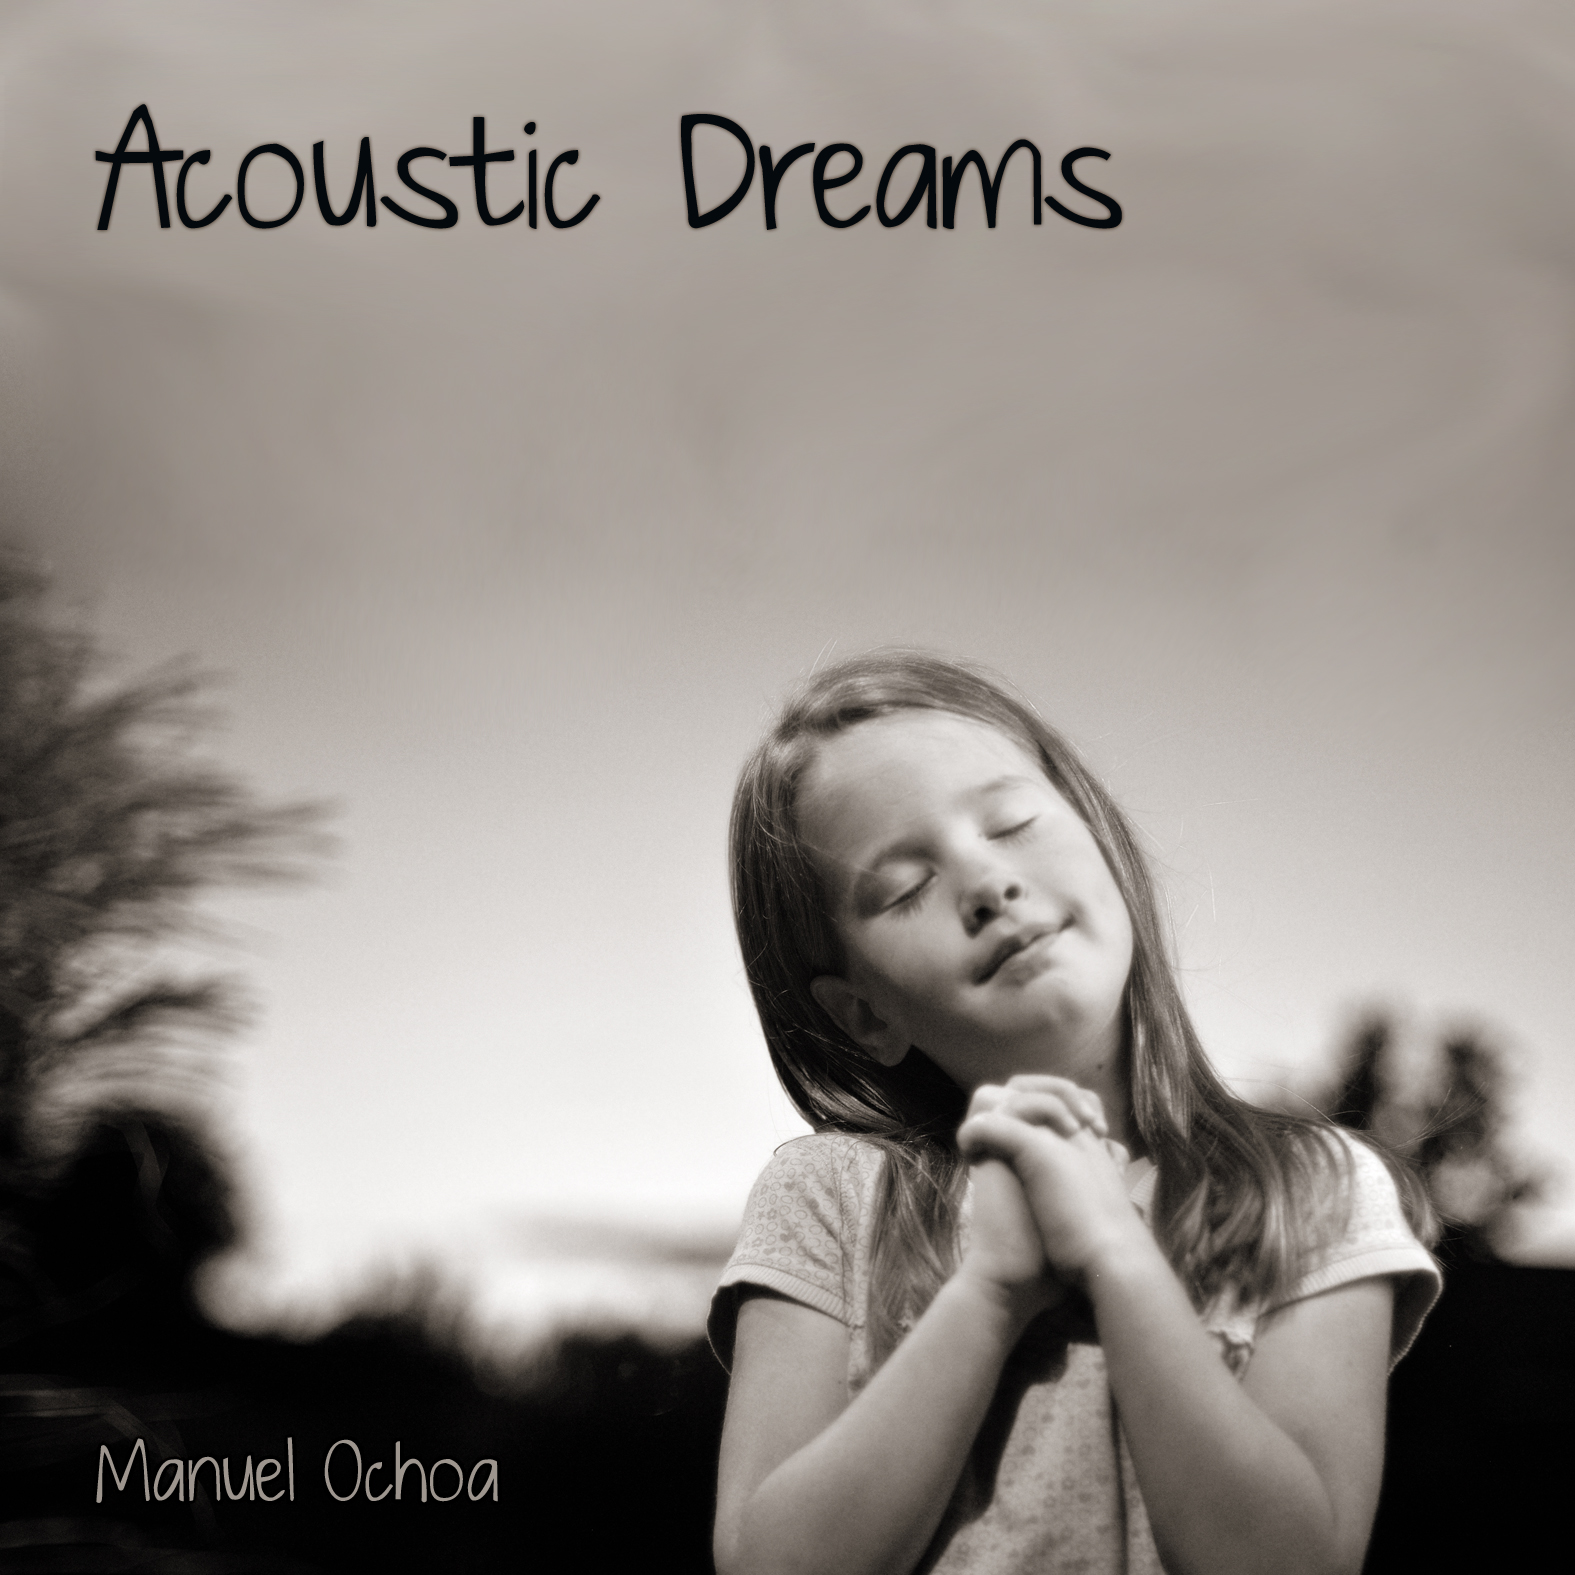 acoustic dreams by manuel ochoa acoustics feng shui project